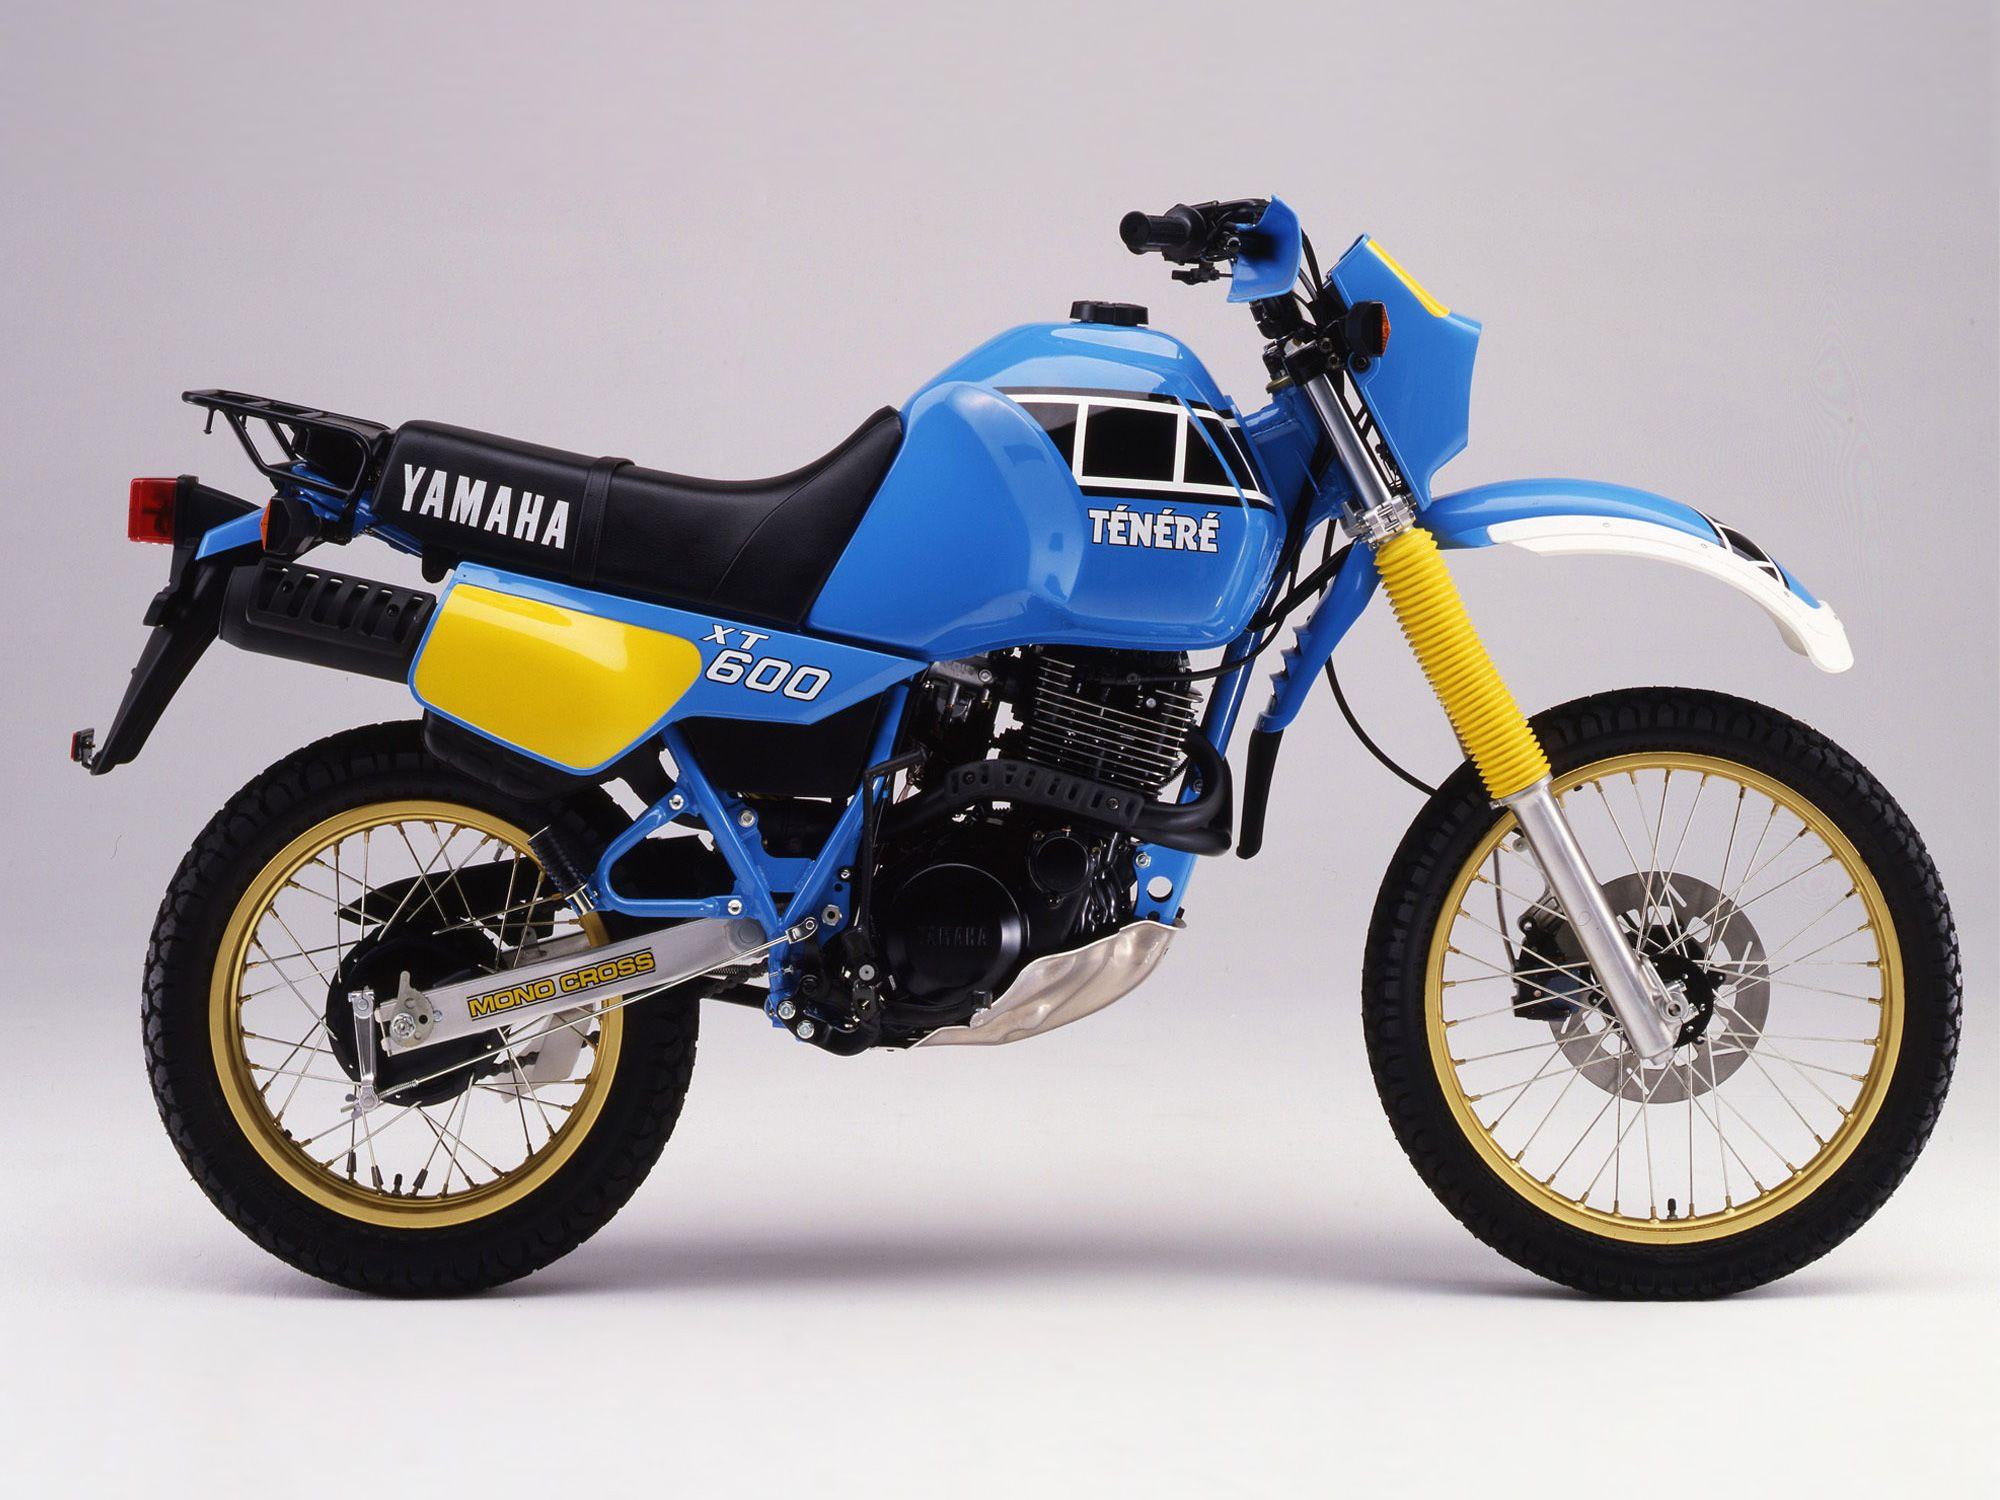 Xt 600 Tenere Google Search Enduro Motorrad Radfahren Rallye